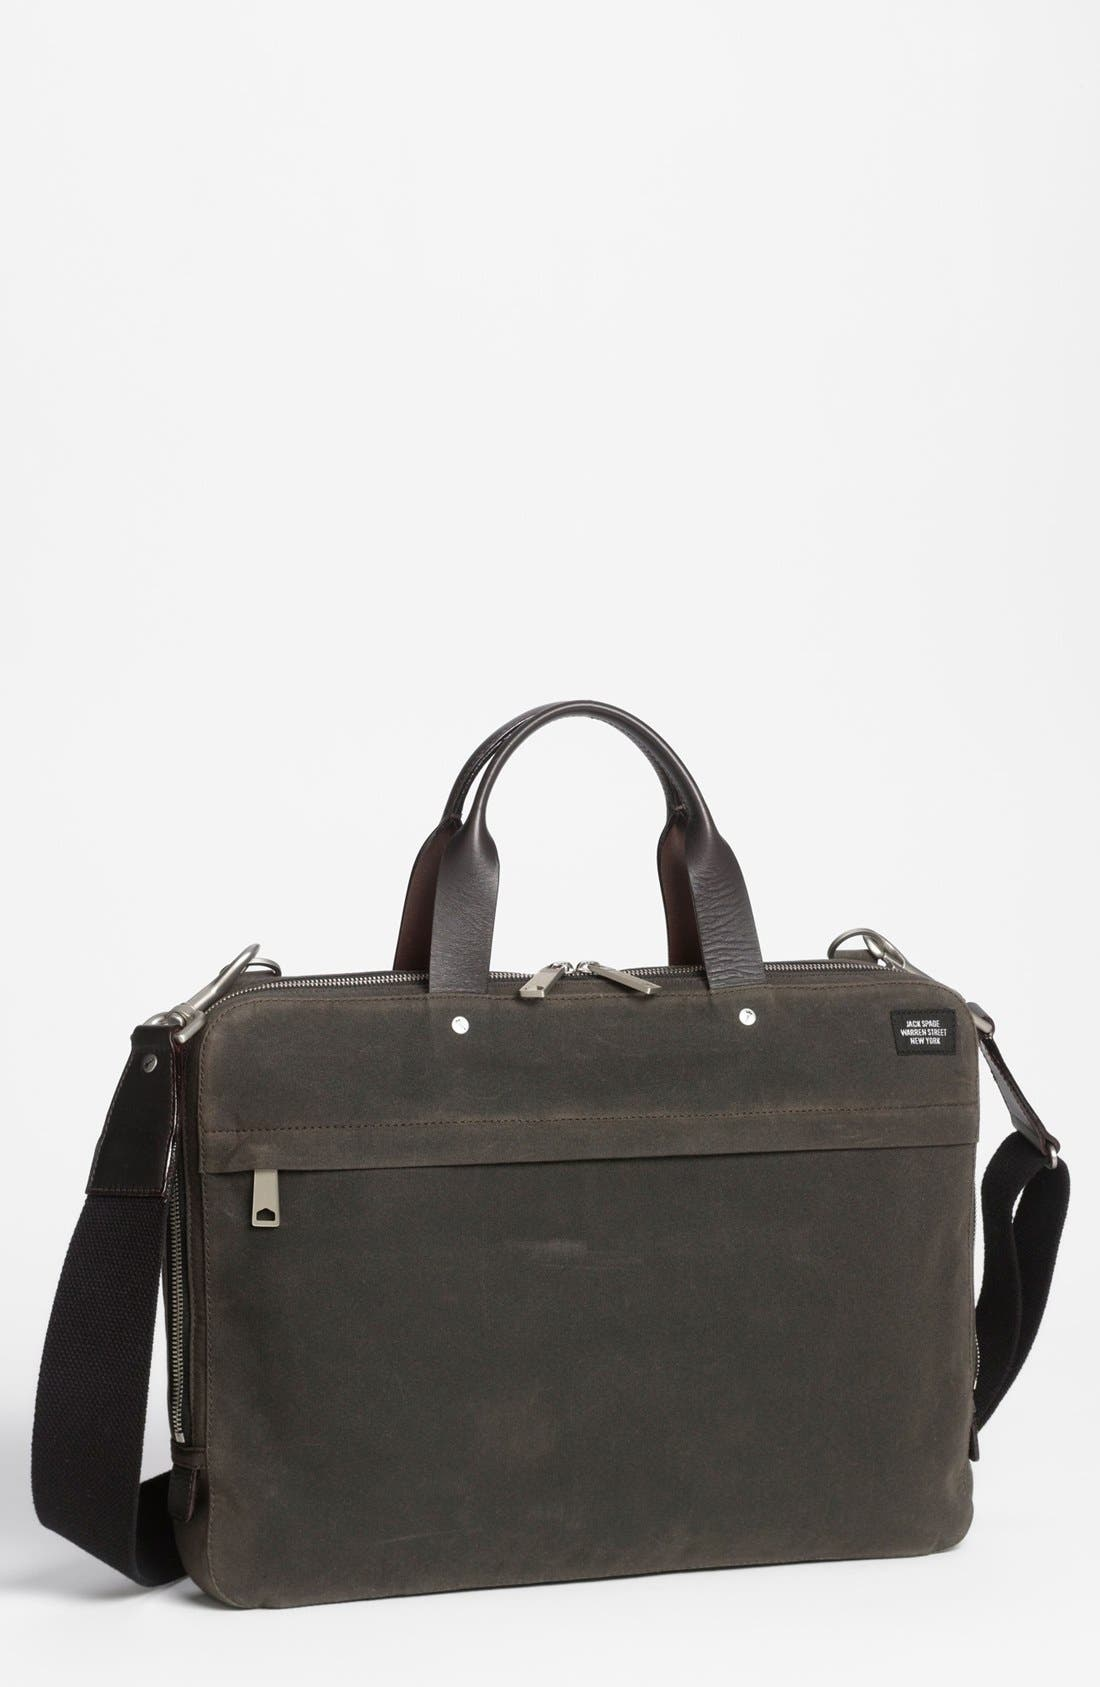 JACK SPADE, 'Waxwear' Briefcase, Main thumbnail 1, color, 215